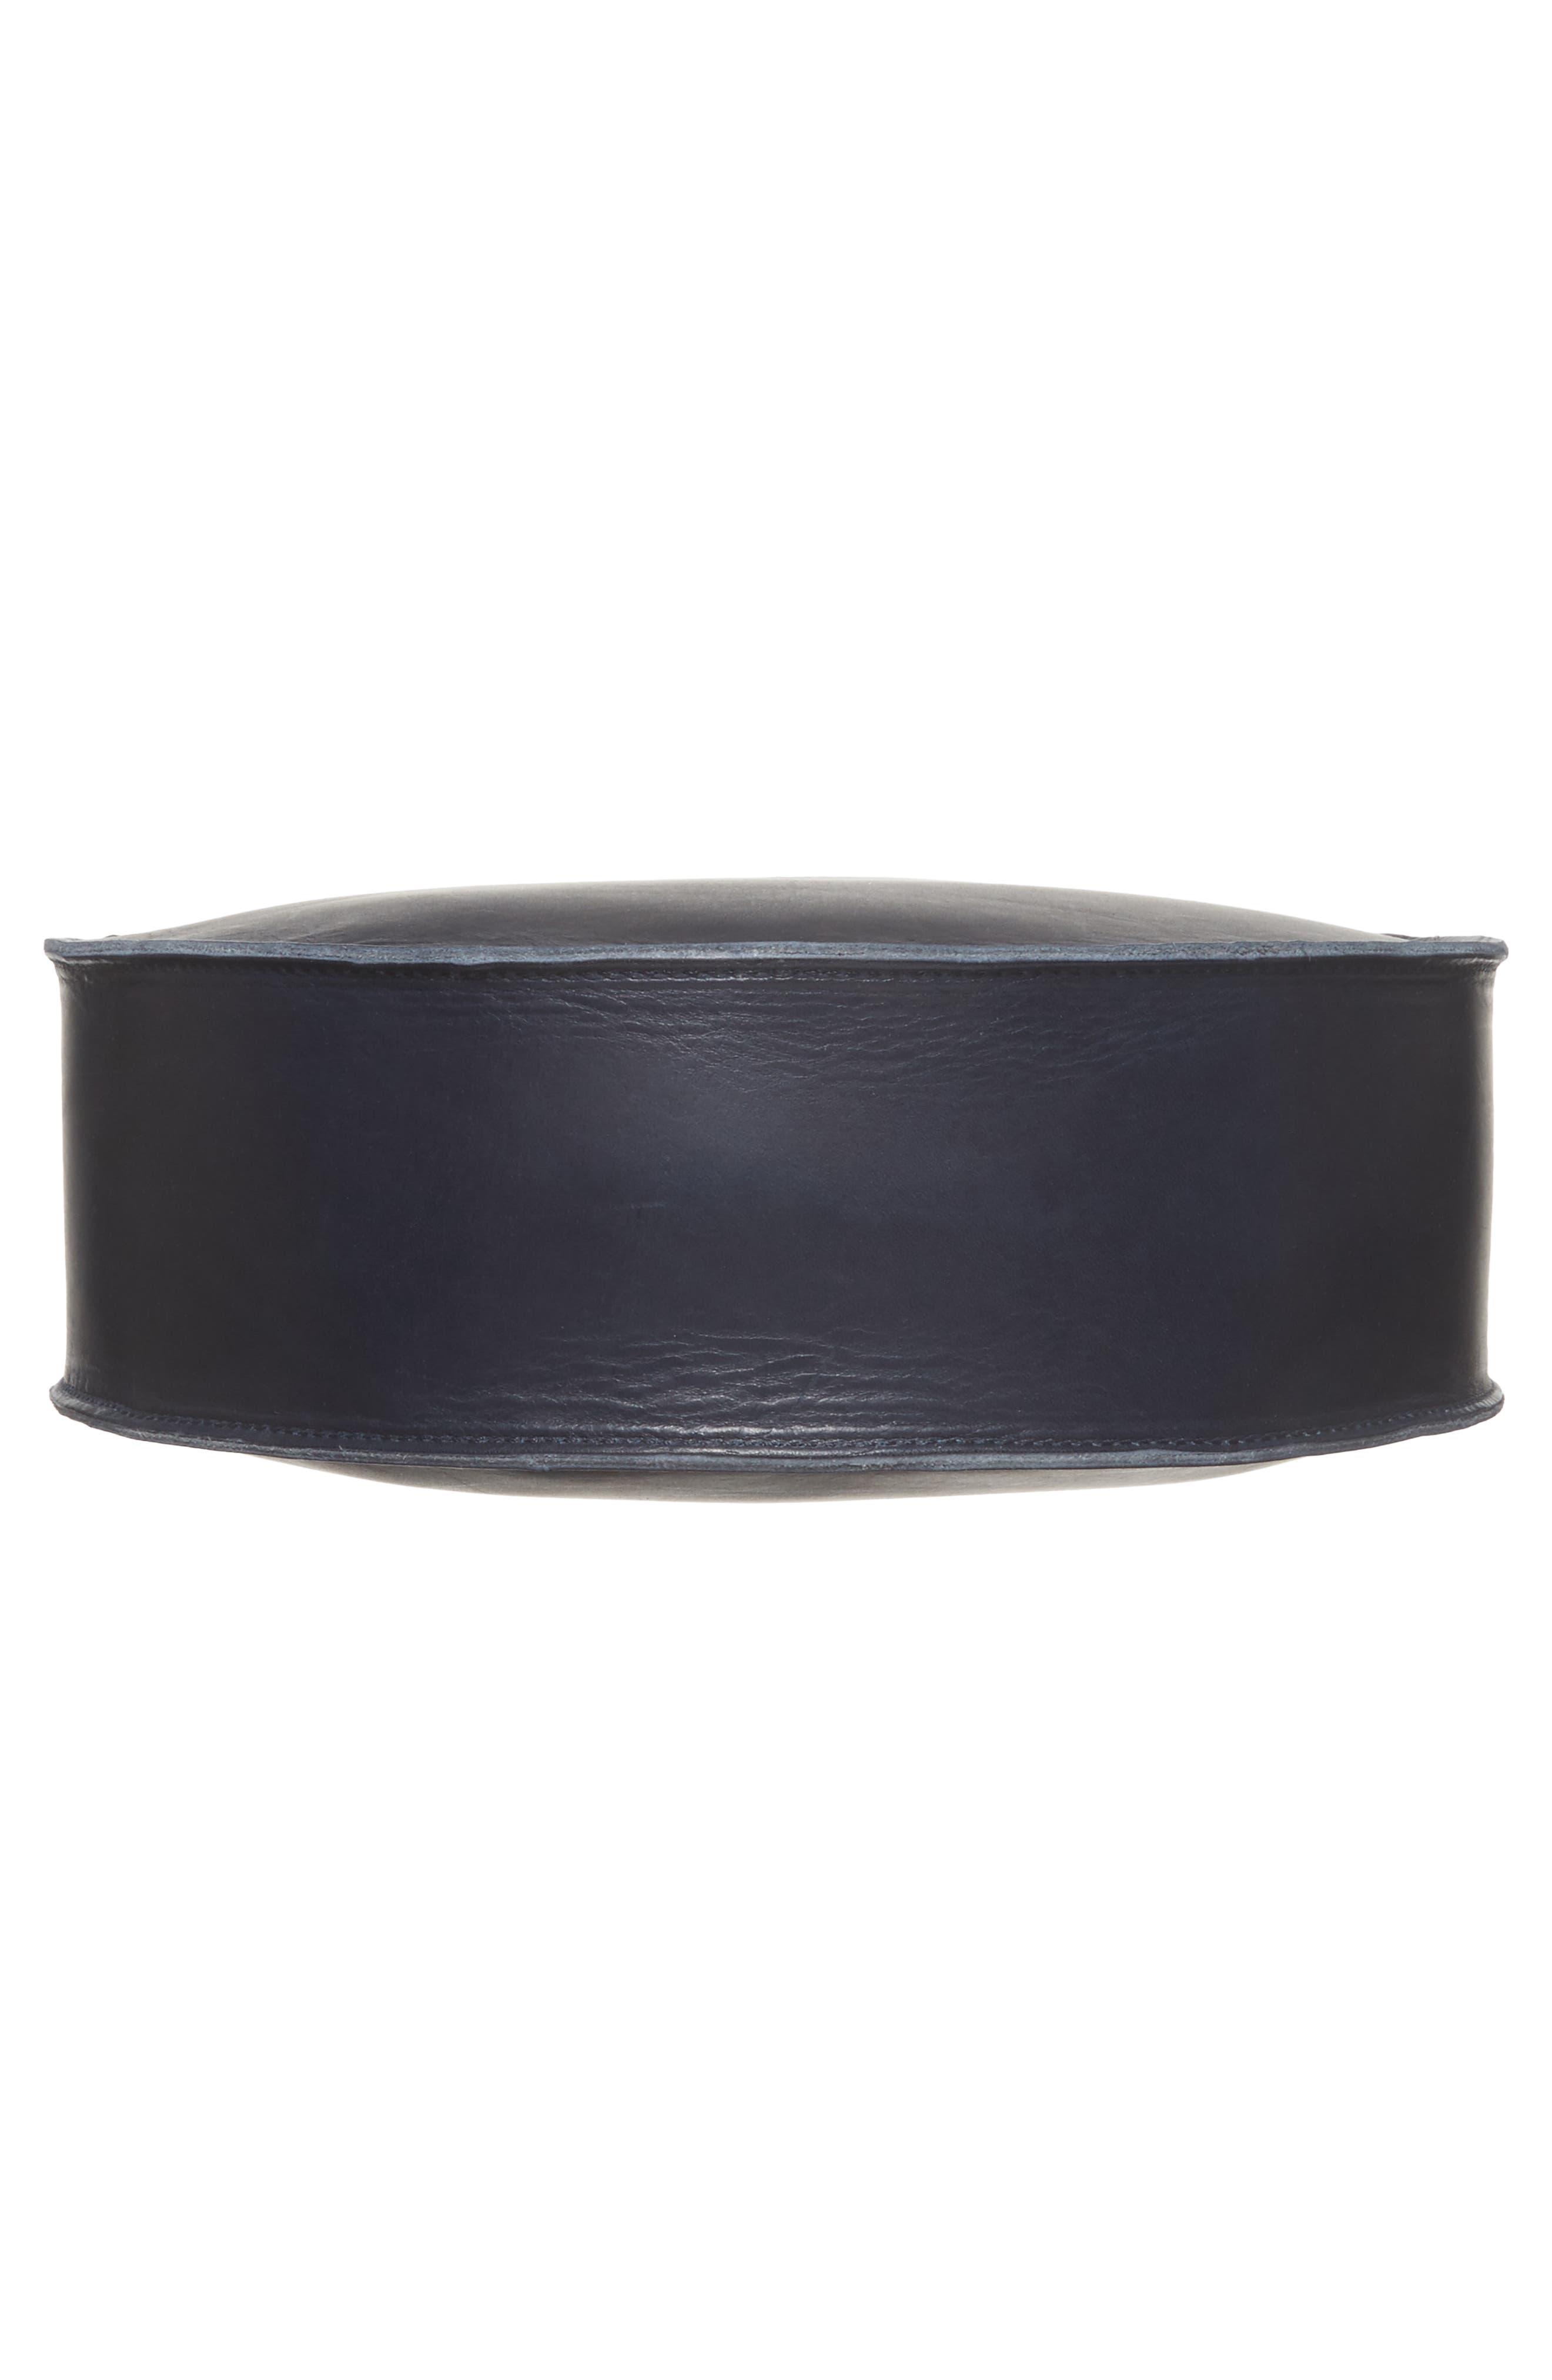 Petite Alistair Leather Circular Crossbody Bag,                             Alternate thumbnail 6, color,